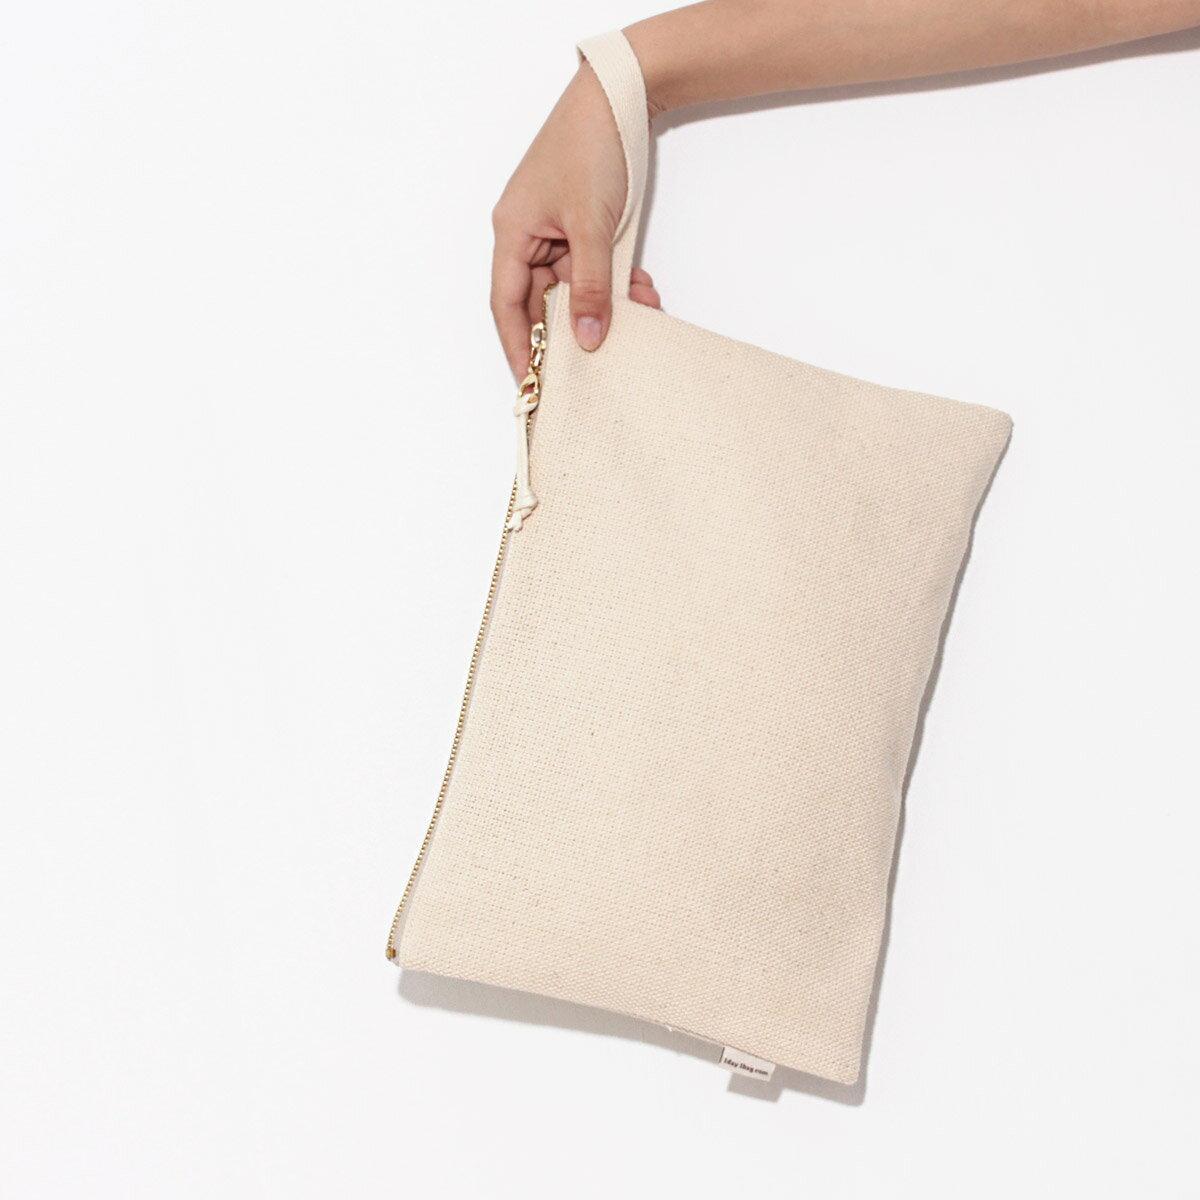 [A4手拿包-原色腕帶] 拉鍊袋/帆布包/Eco包/手拿包/上課包/1day1bag